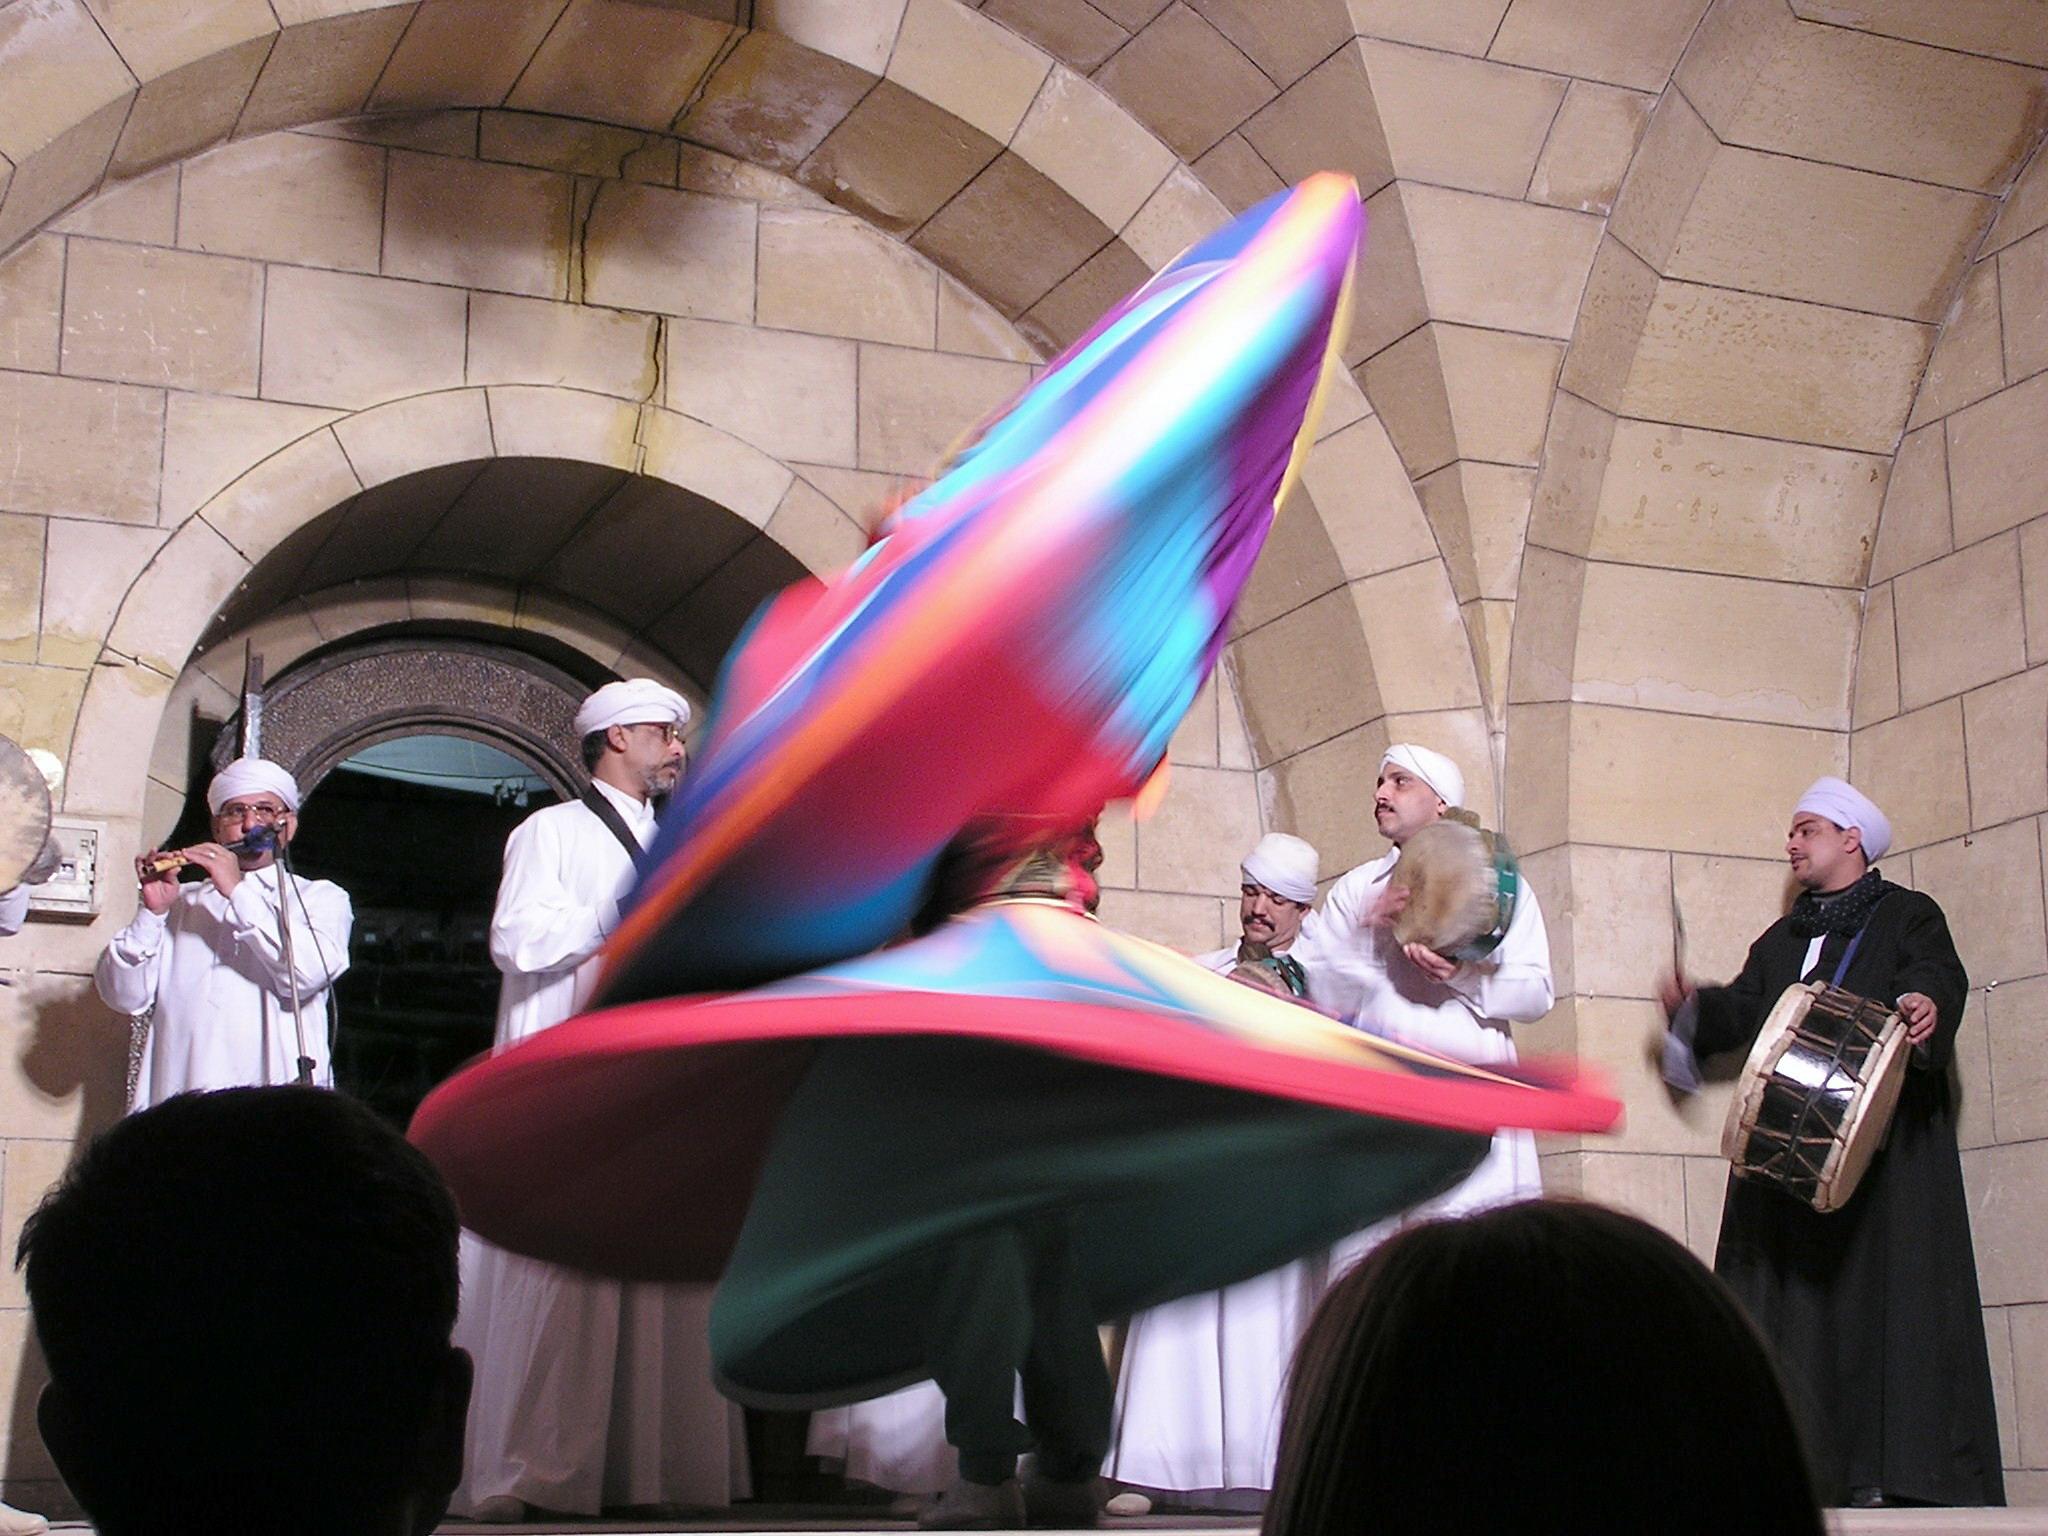 Baile Derviches El Cairo Egipto